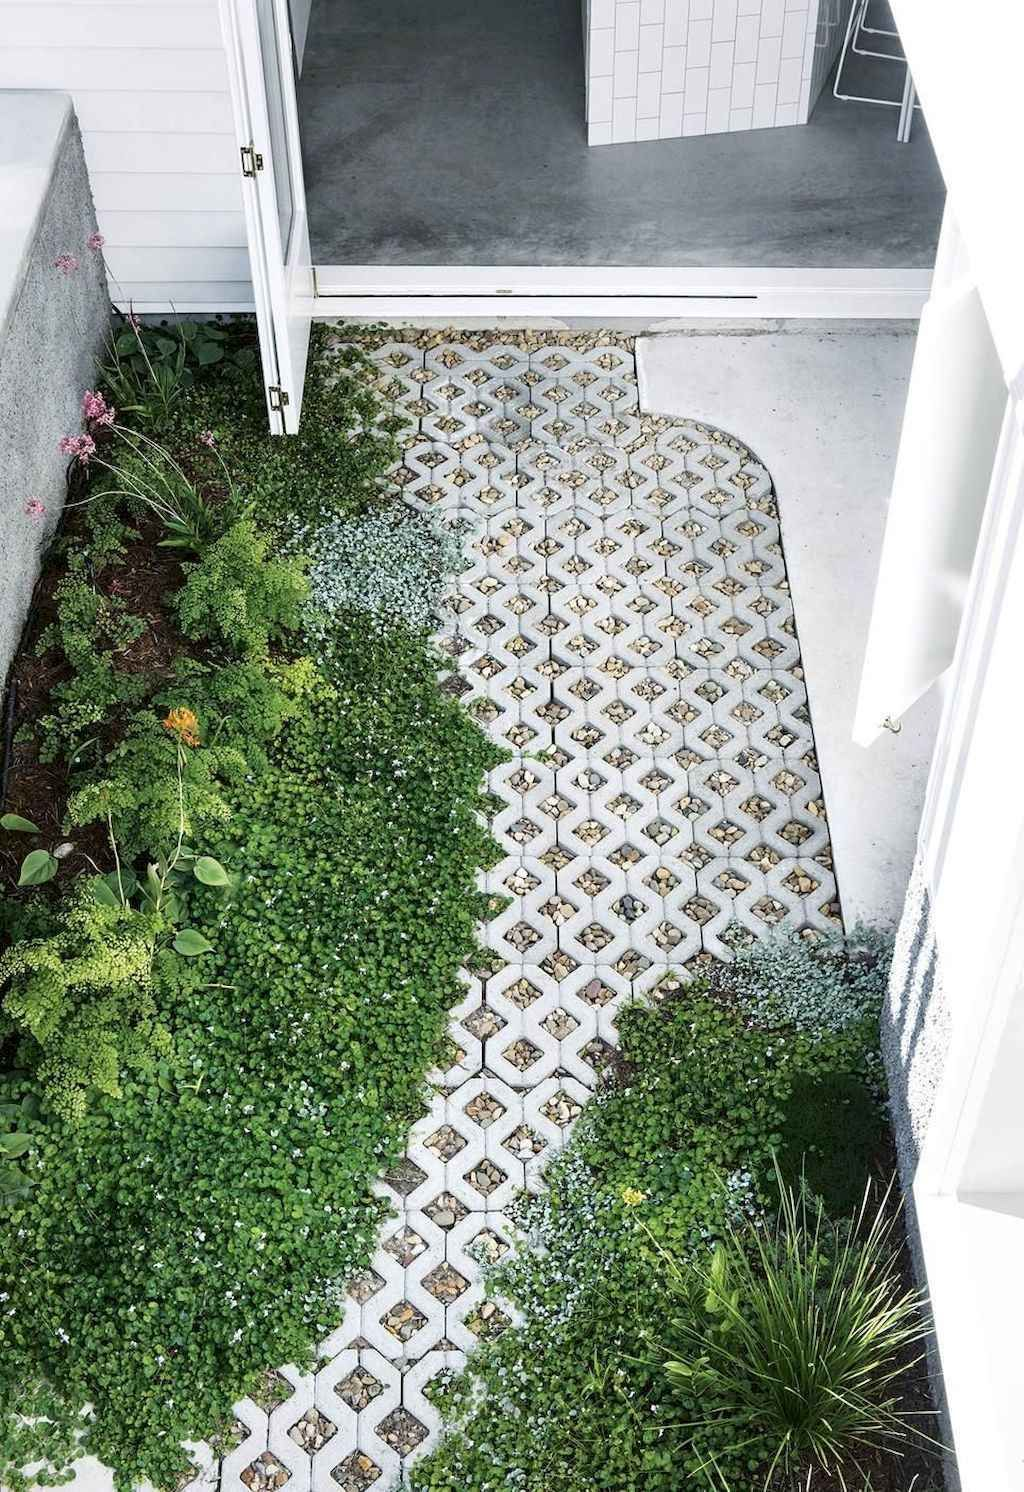 27 Incredible Side House Garden Landscaping Ideas With Rocks Backyard Garden Design Grass Pavers Backyard Landscaping